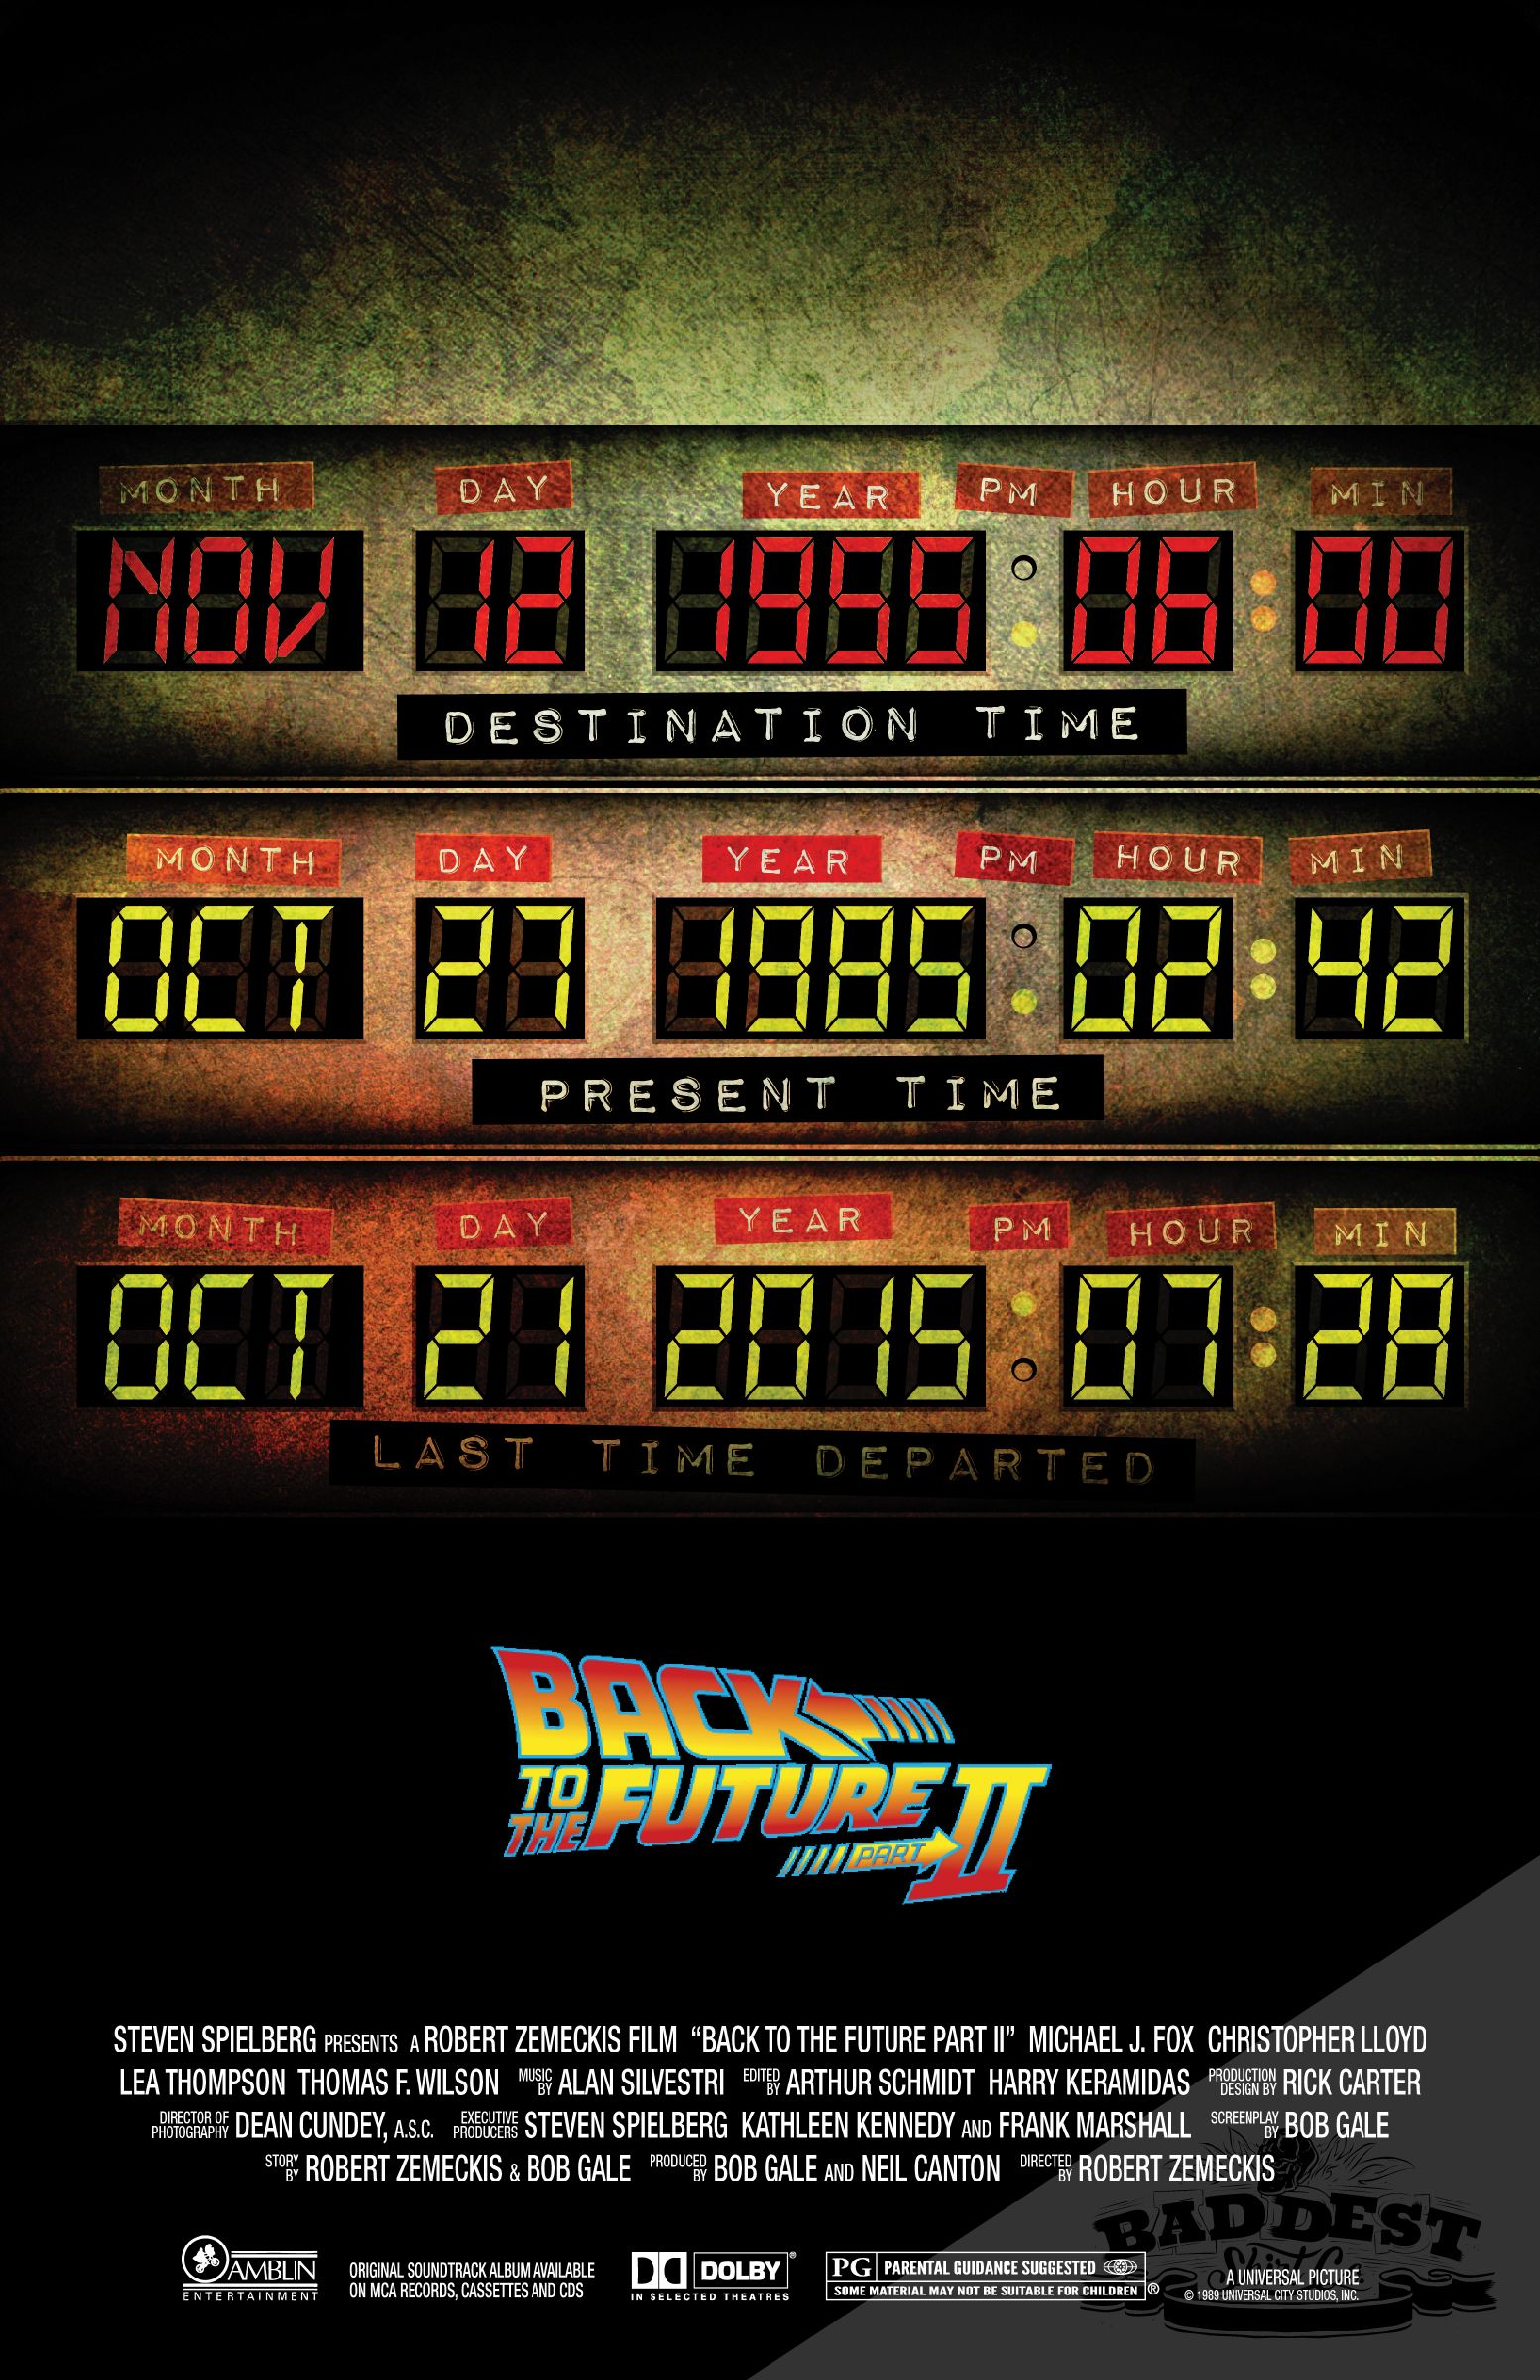 Back to the future 2 retour vers le futur